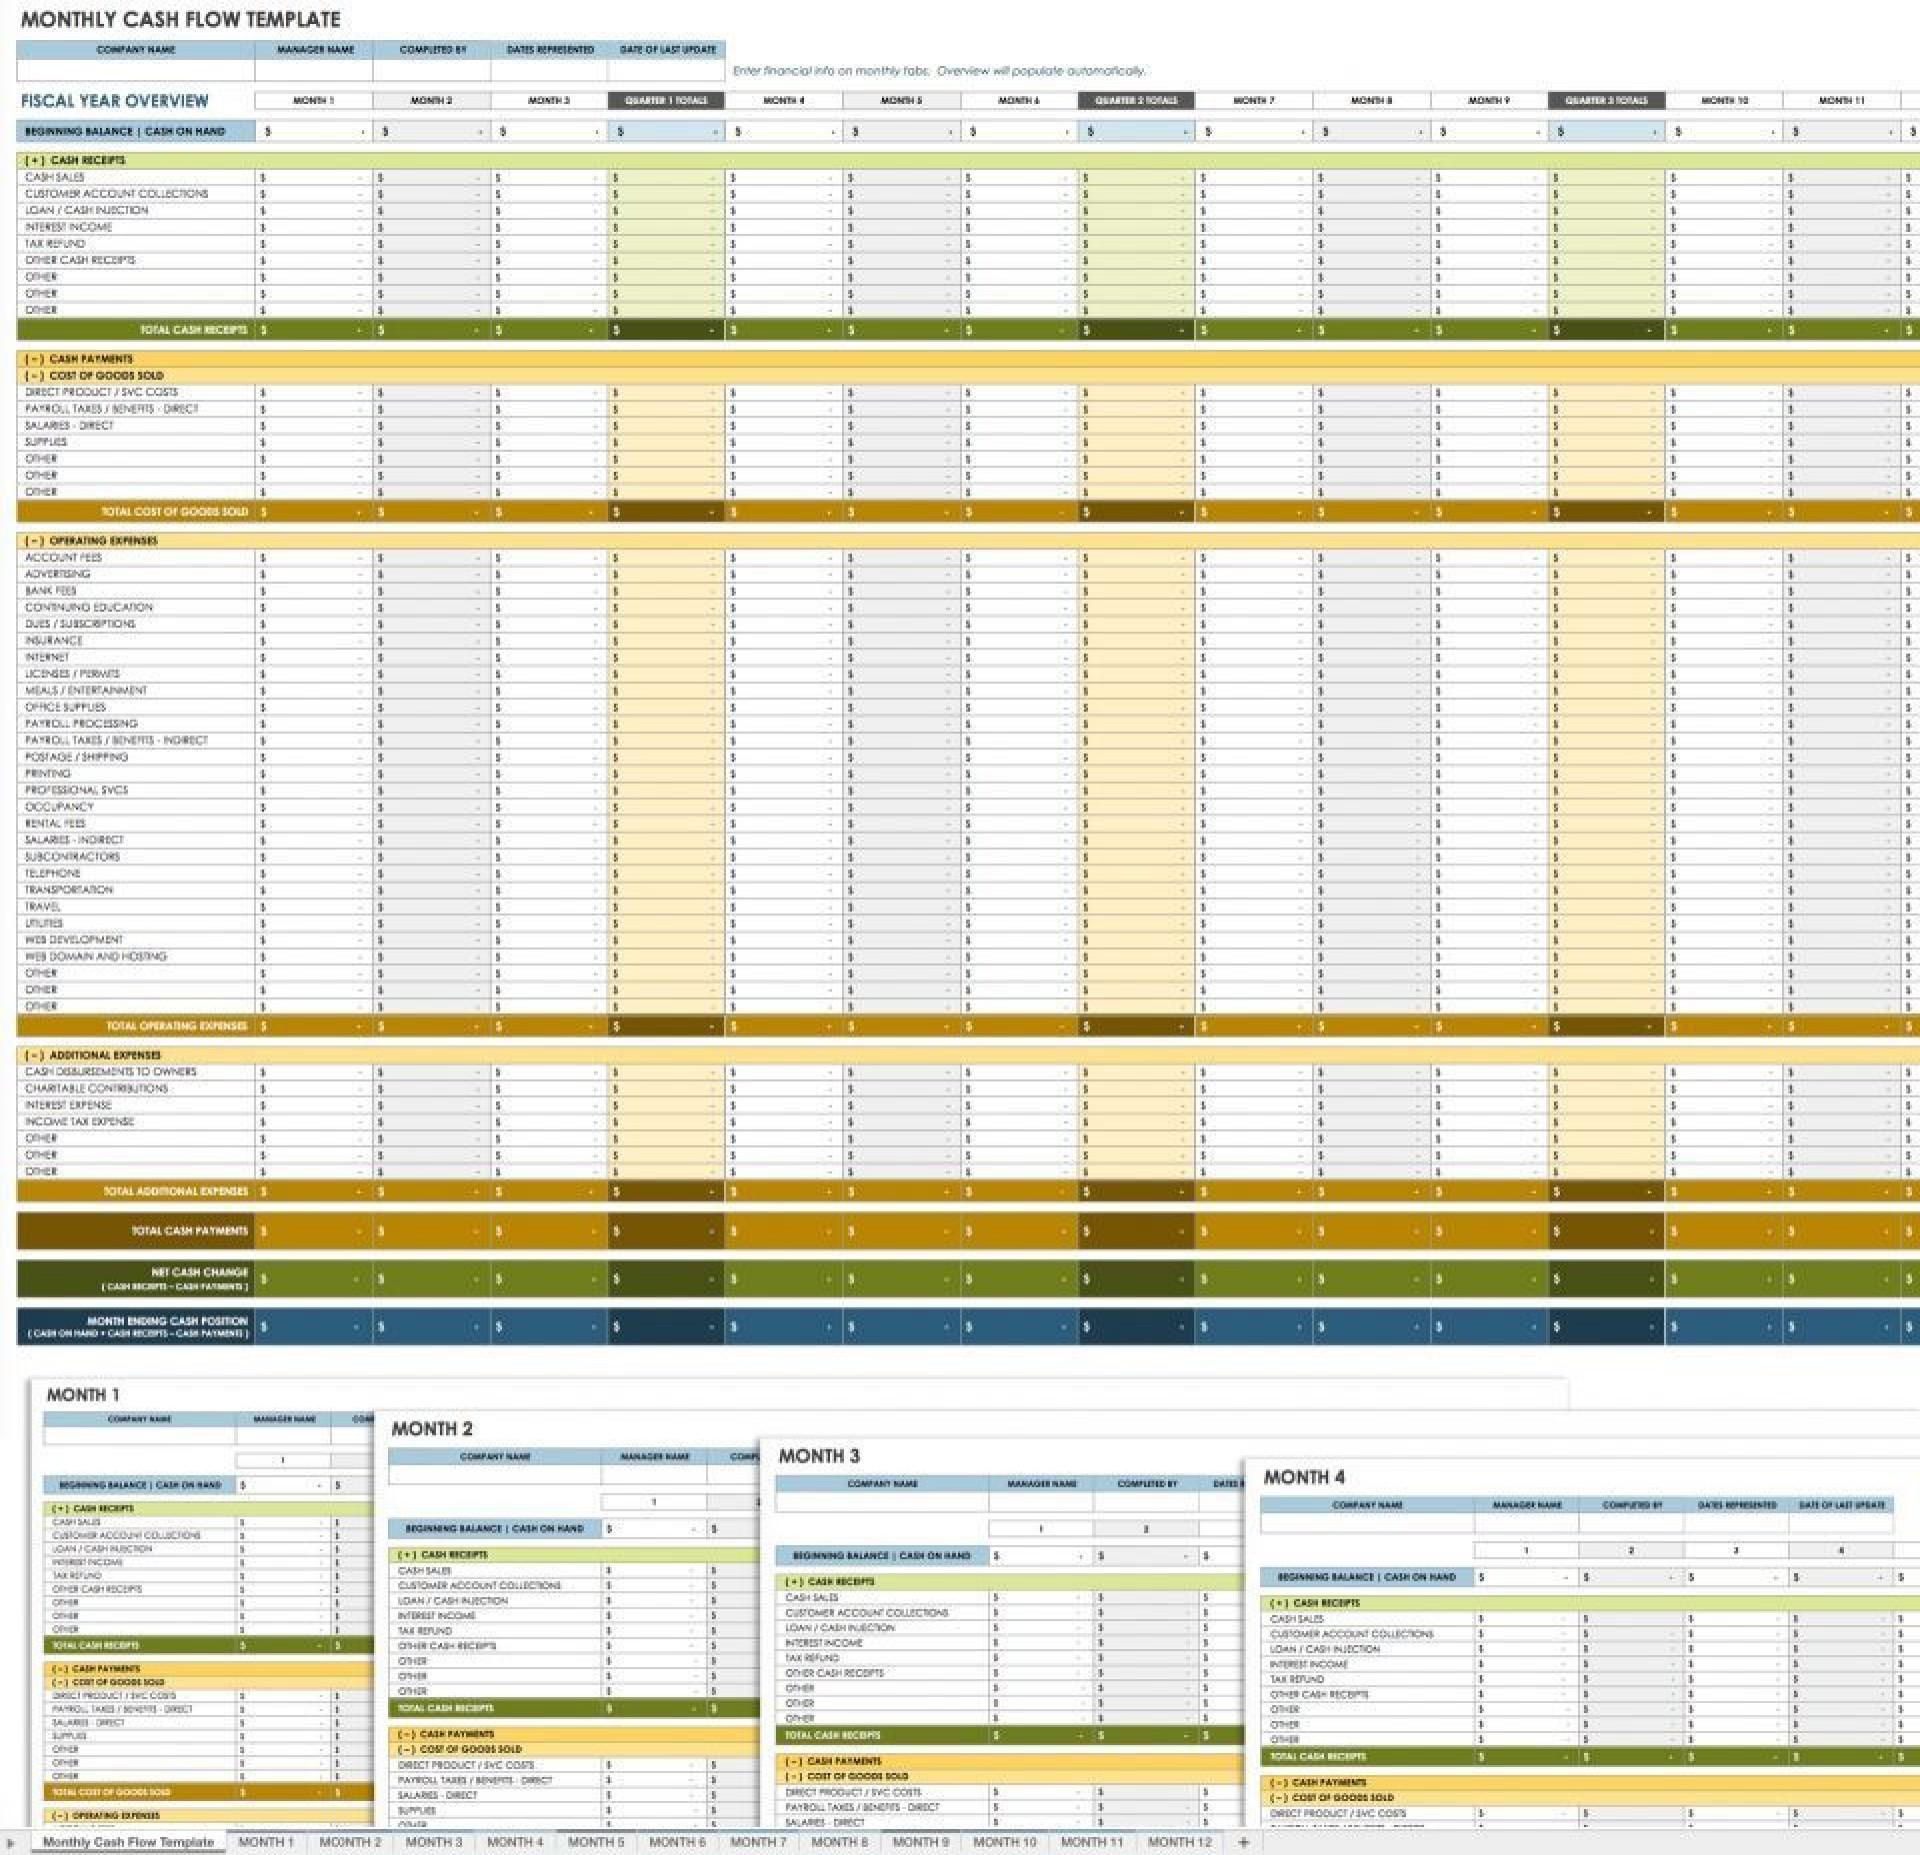 007 Frightening Cash Flow Template Excel Free High Def  Statement Download Format In1920